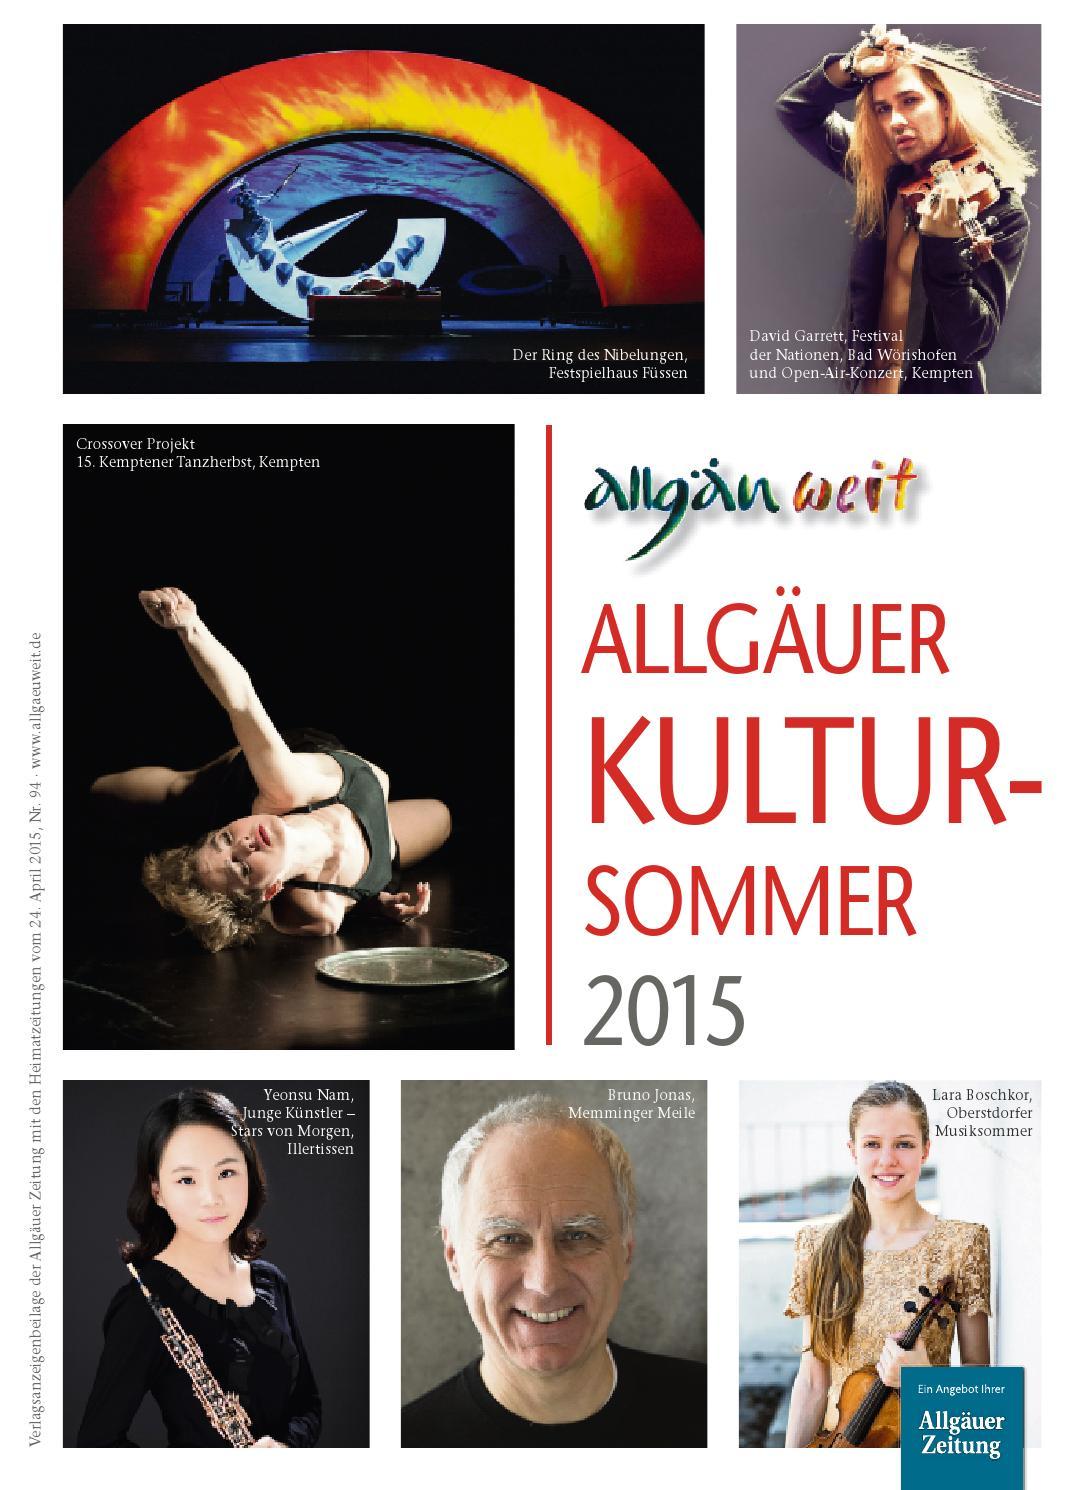 Allgäuweit Allgäuer Kultursommer 2015 By Rtadesign Gmbh Issuu